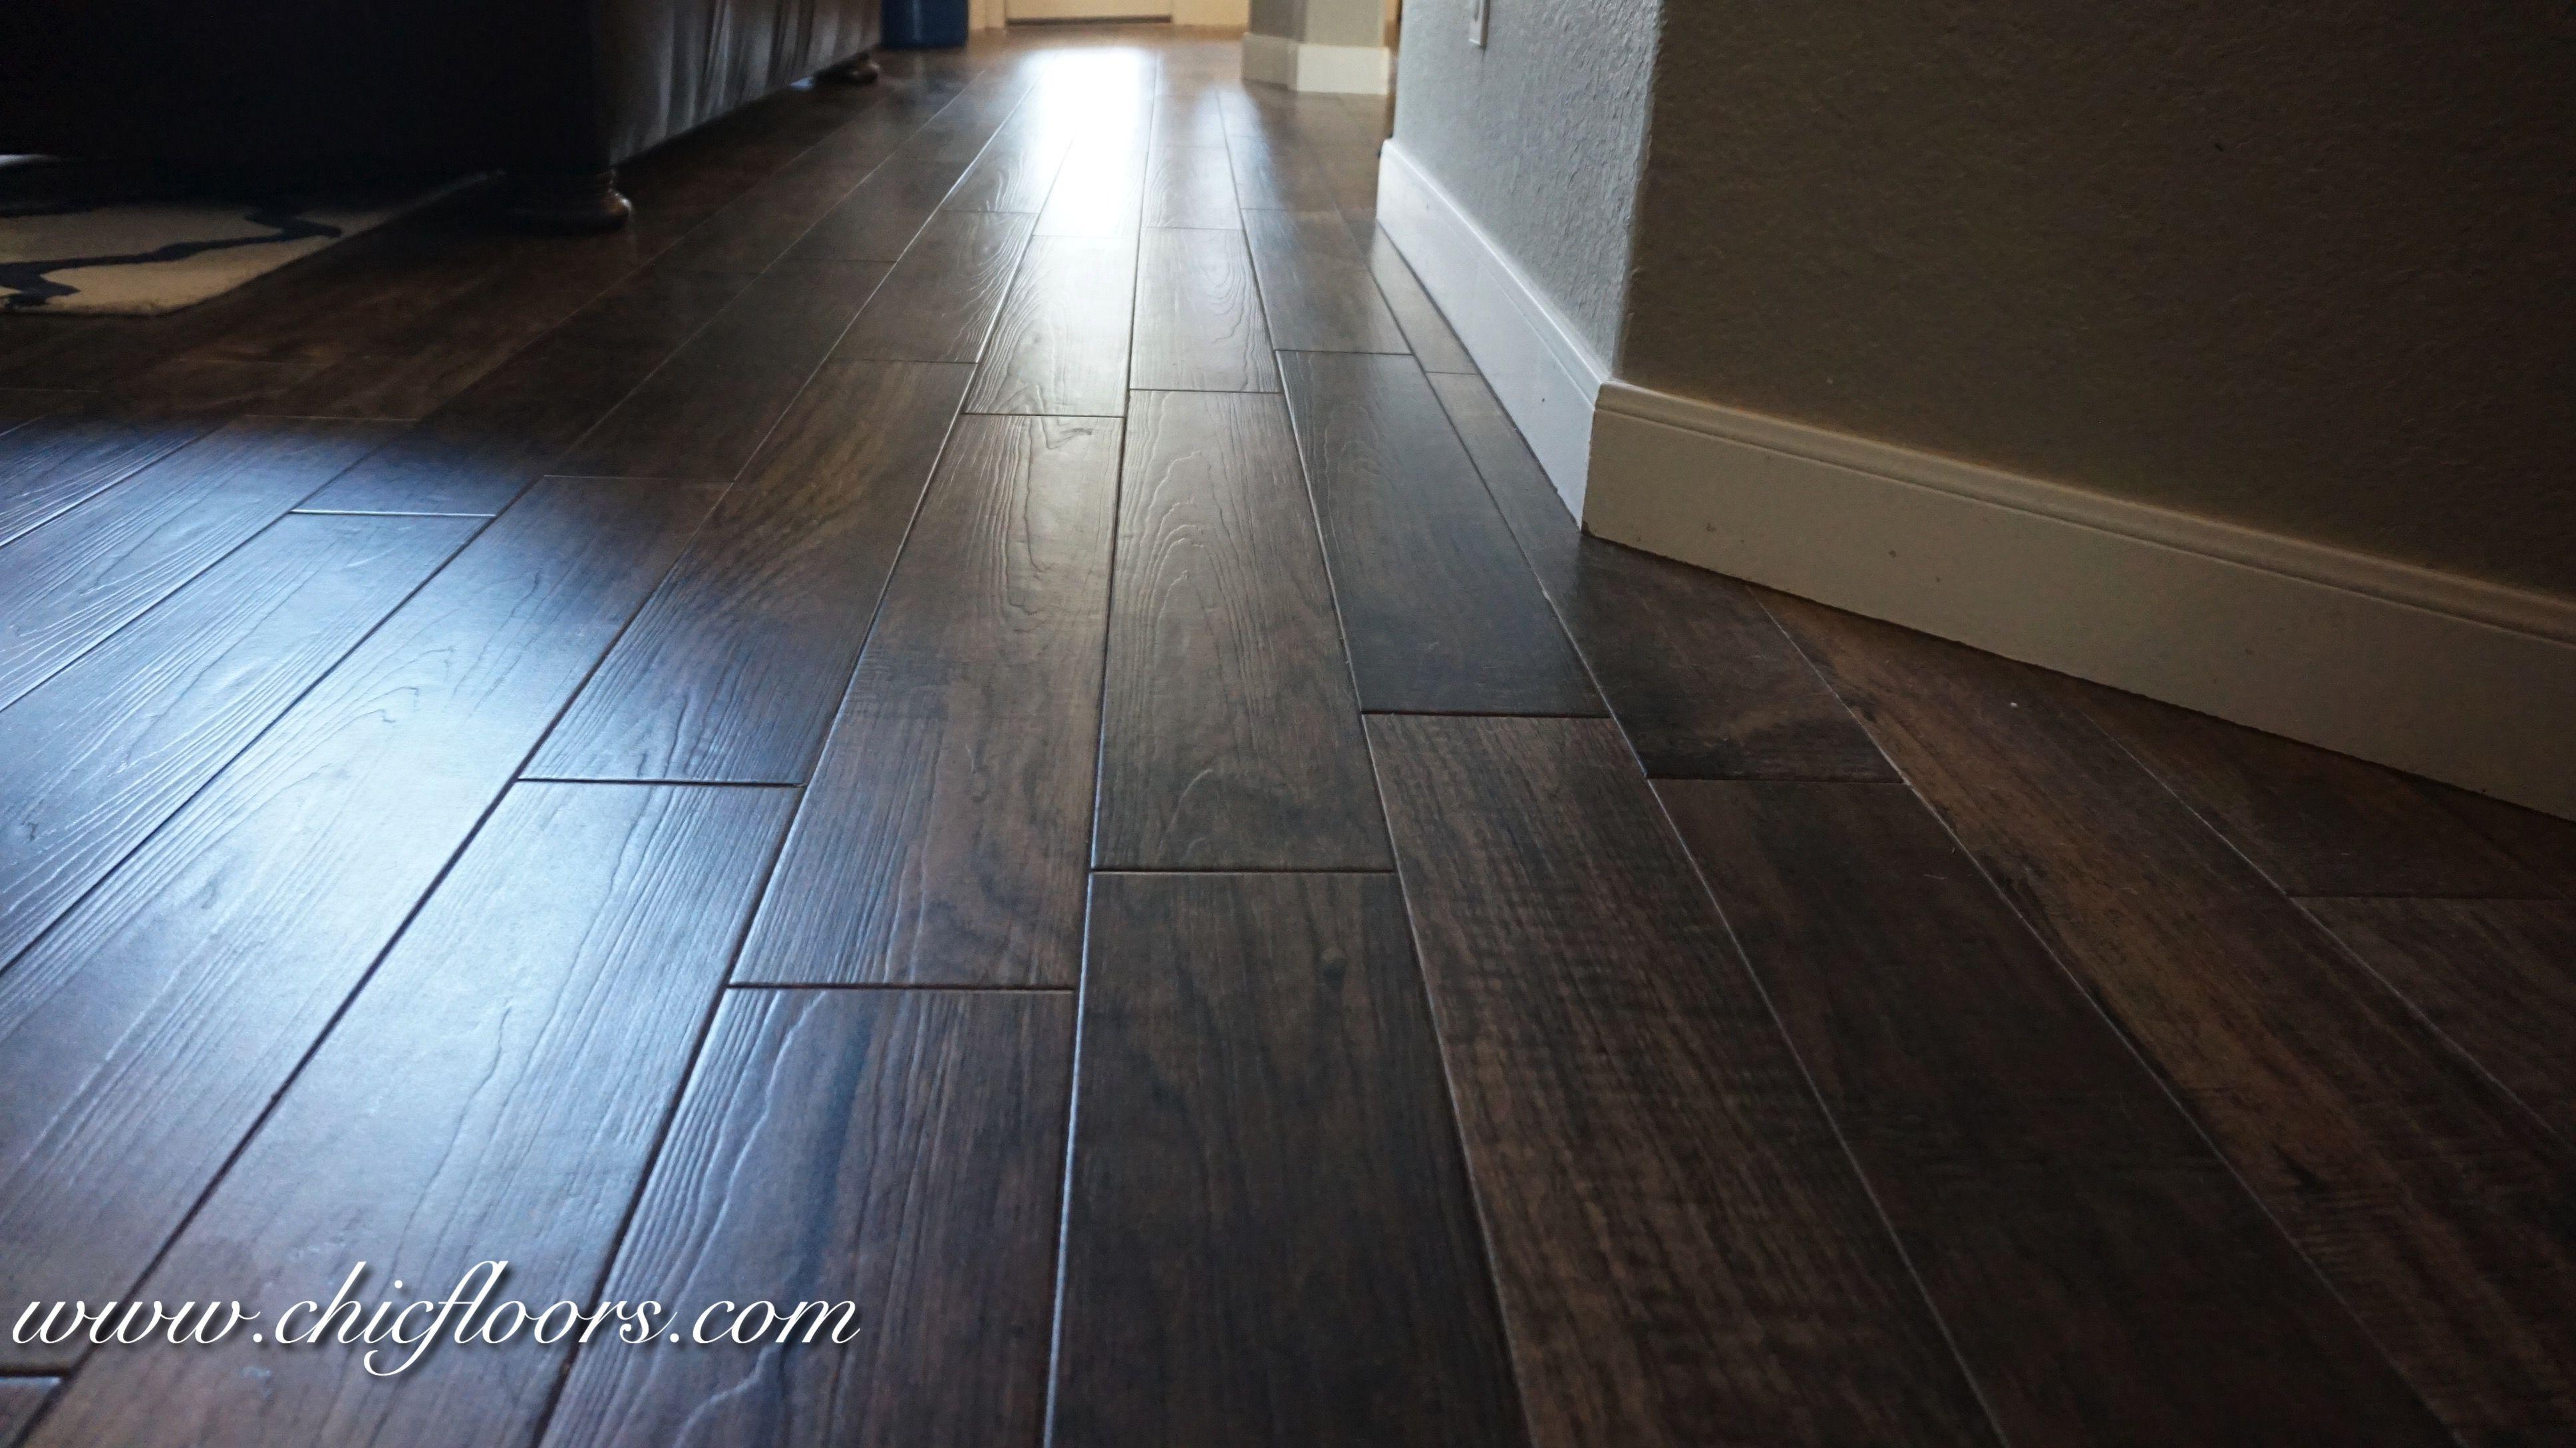 shaw 3 4 hardwood flooring of beautiful wood look tile by shaw hacienda color walnut our work pertaining to beautiful wood look tile by shaw hacienda color walnut wood look tile flooring ideas